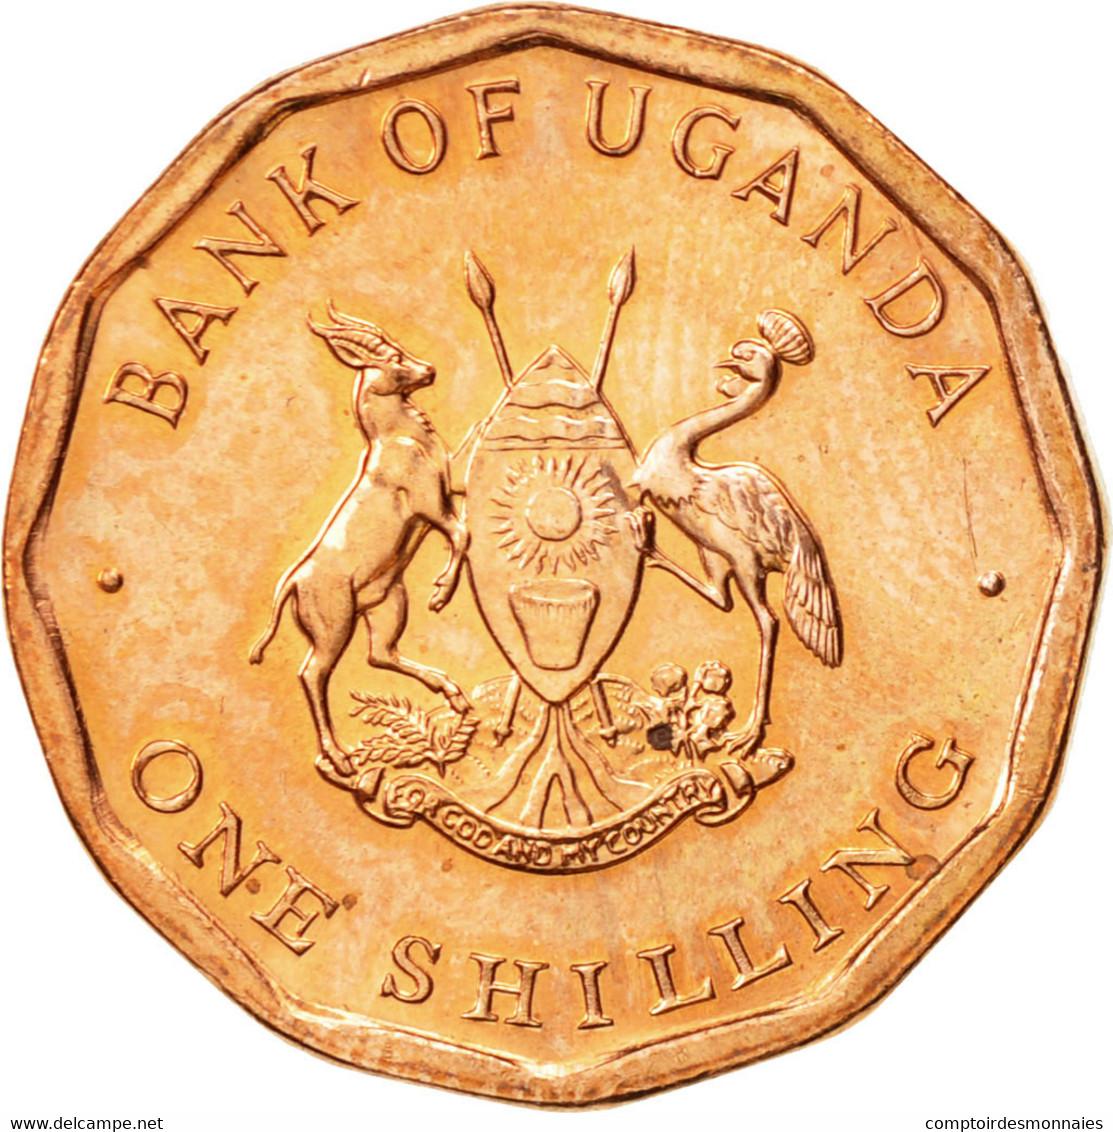 Uganda, Shilling, 1987, SPL, Copper Plated Steel, KM:27 - Ouganda